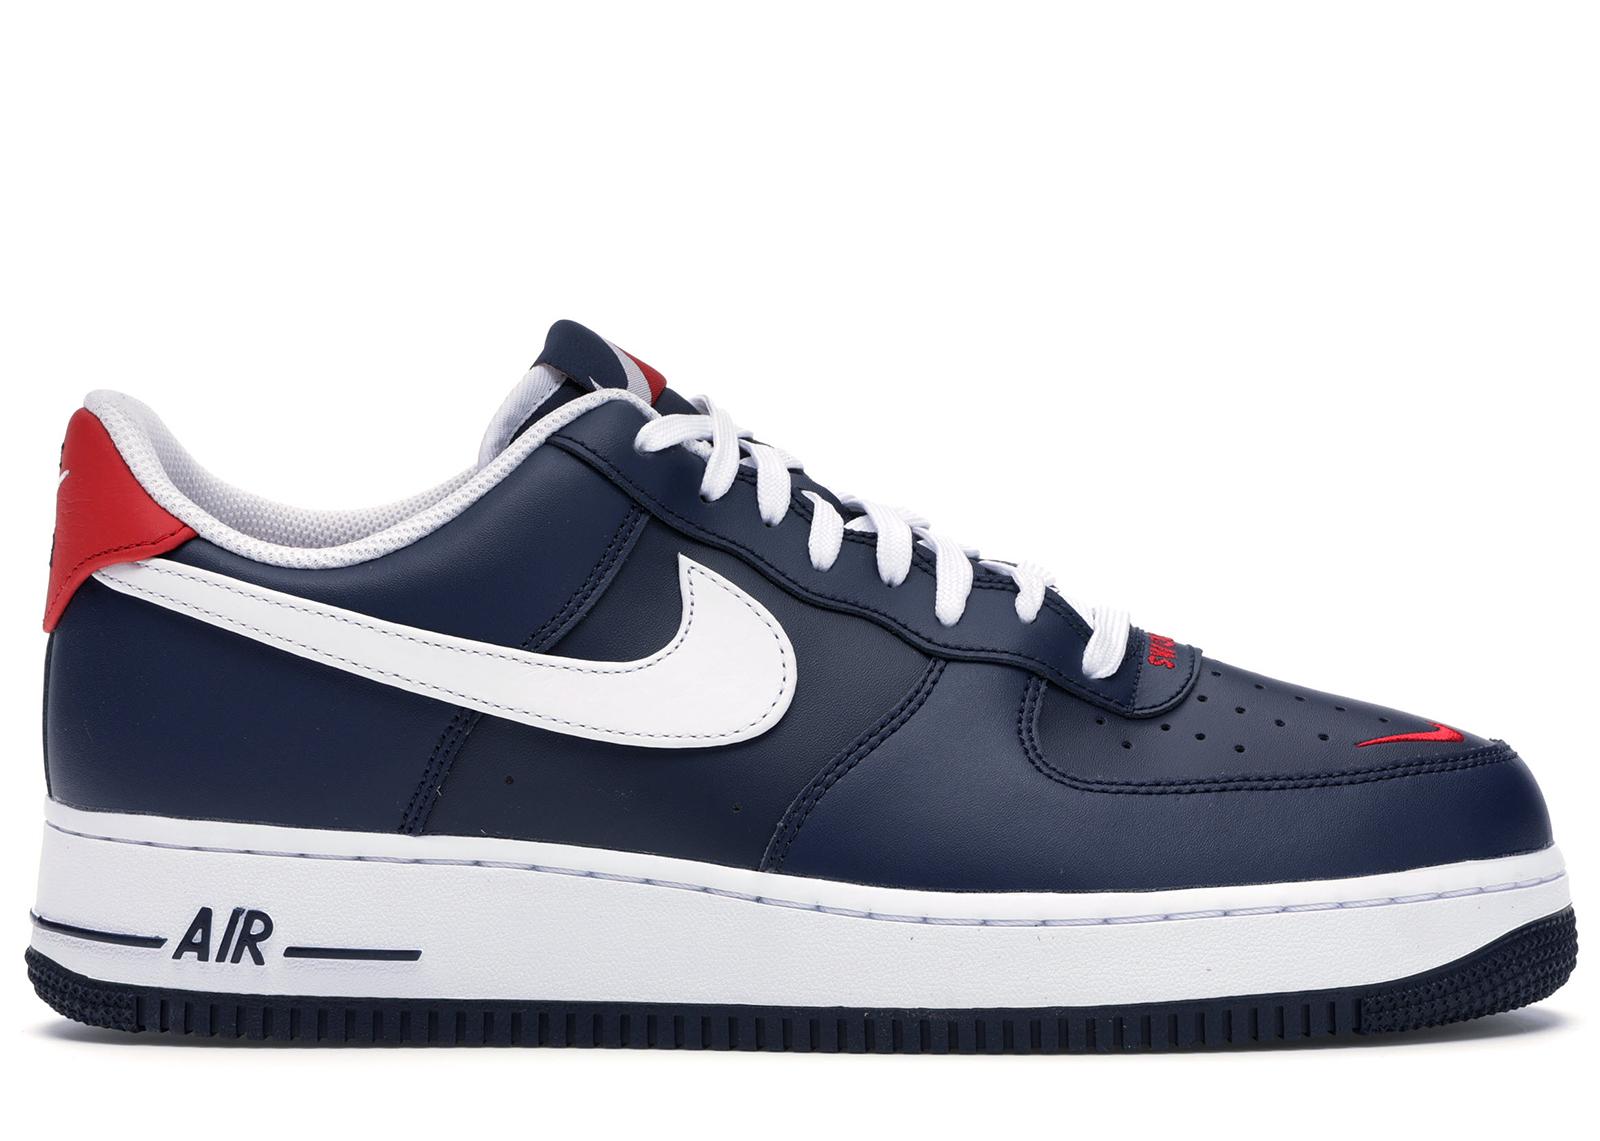 Nike Air Force 1 Low Swoosh Pack Navy